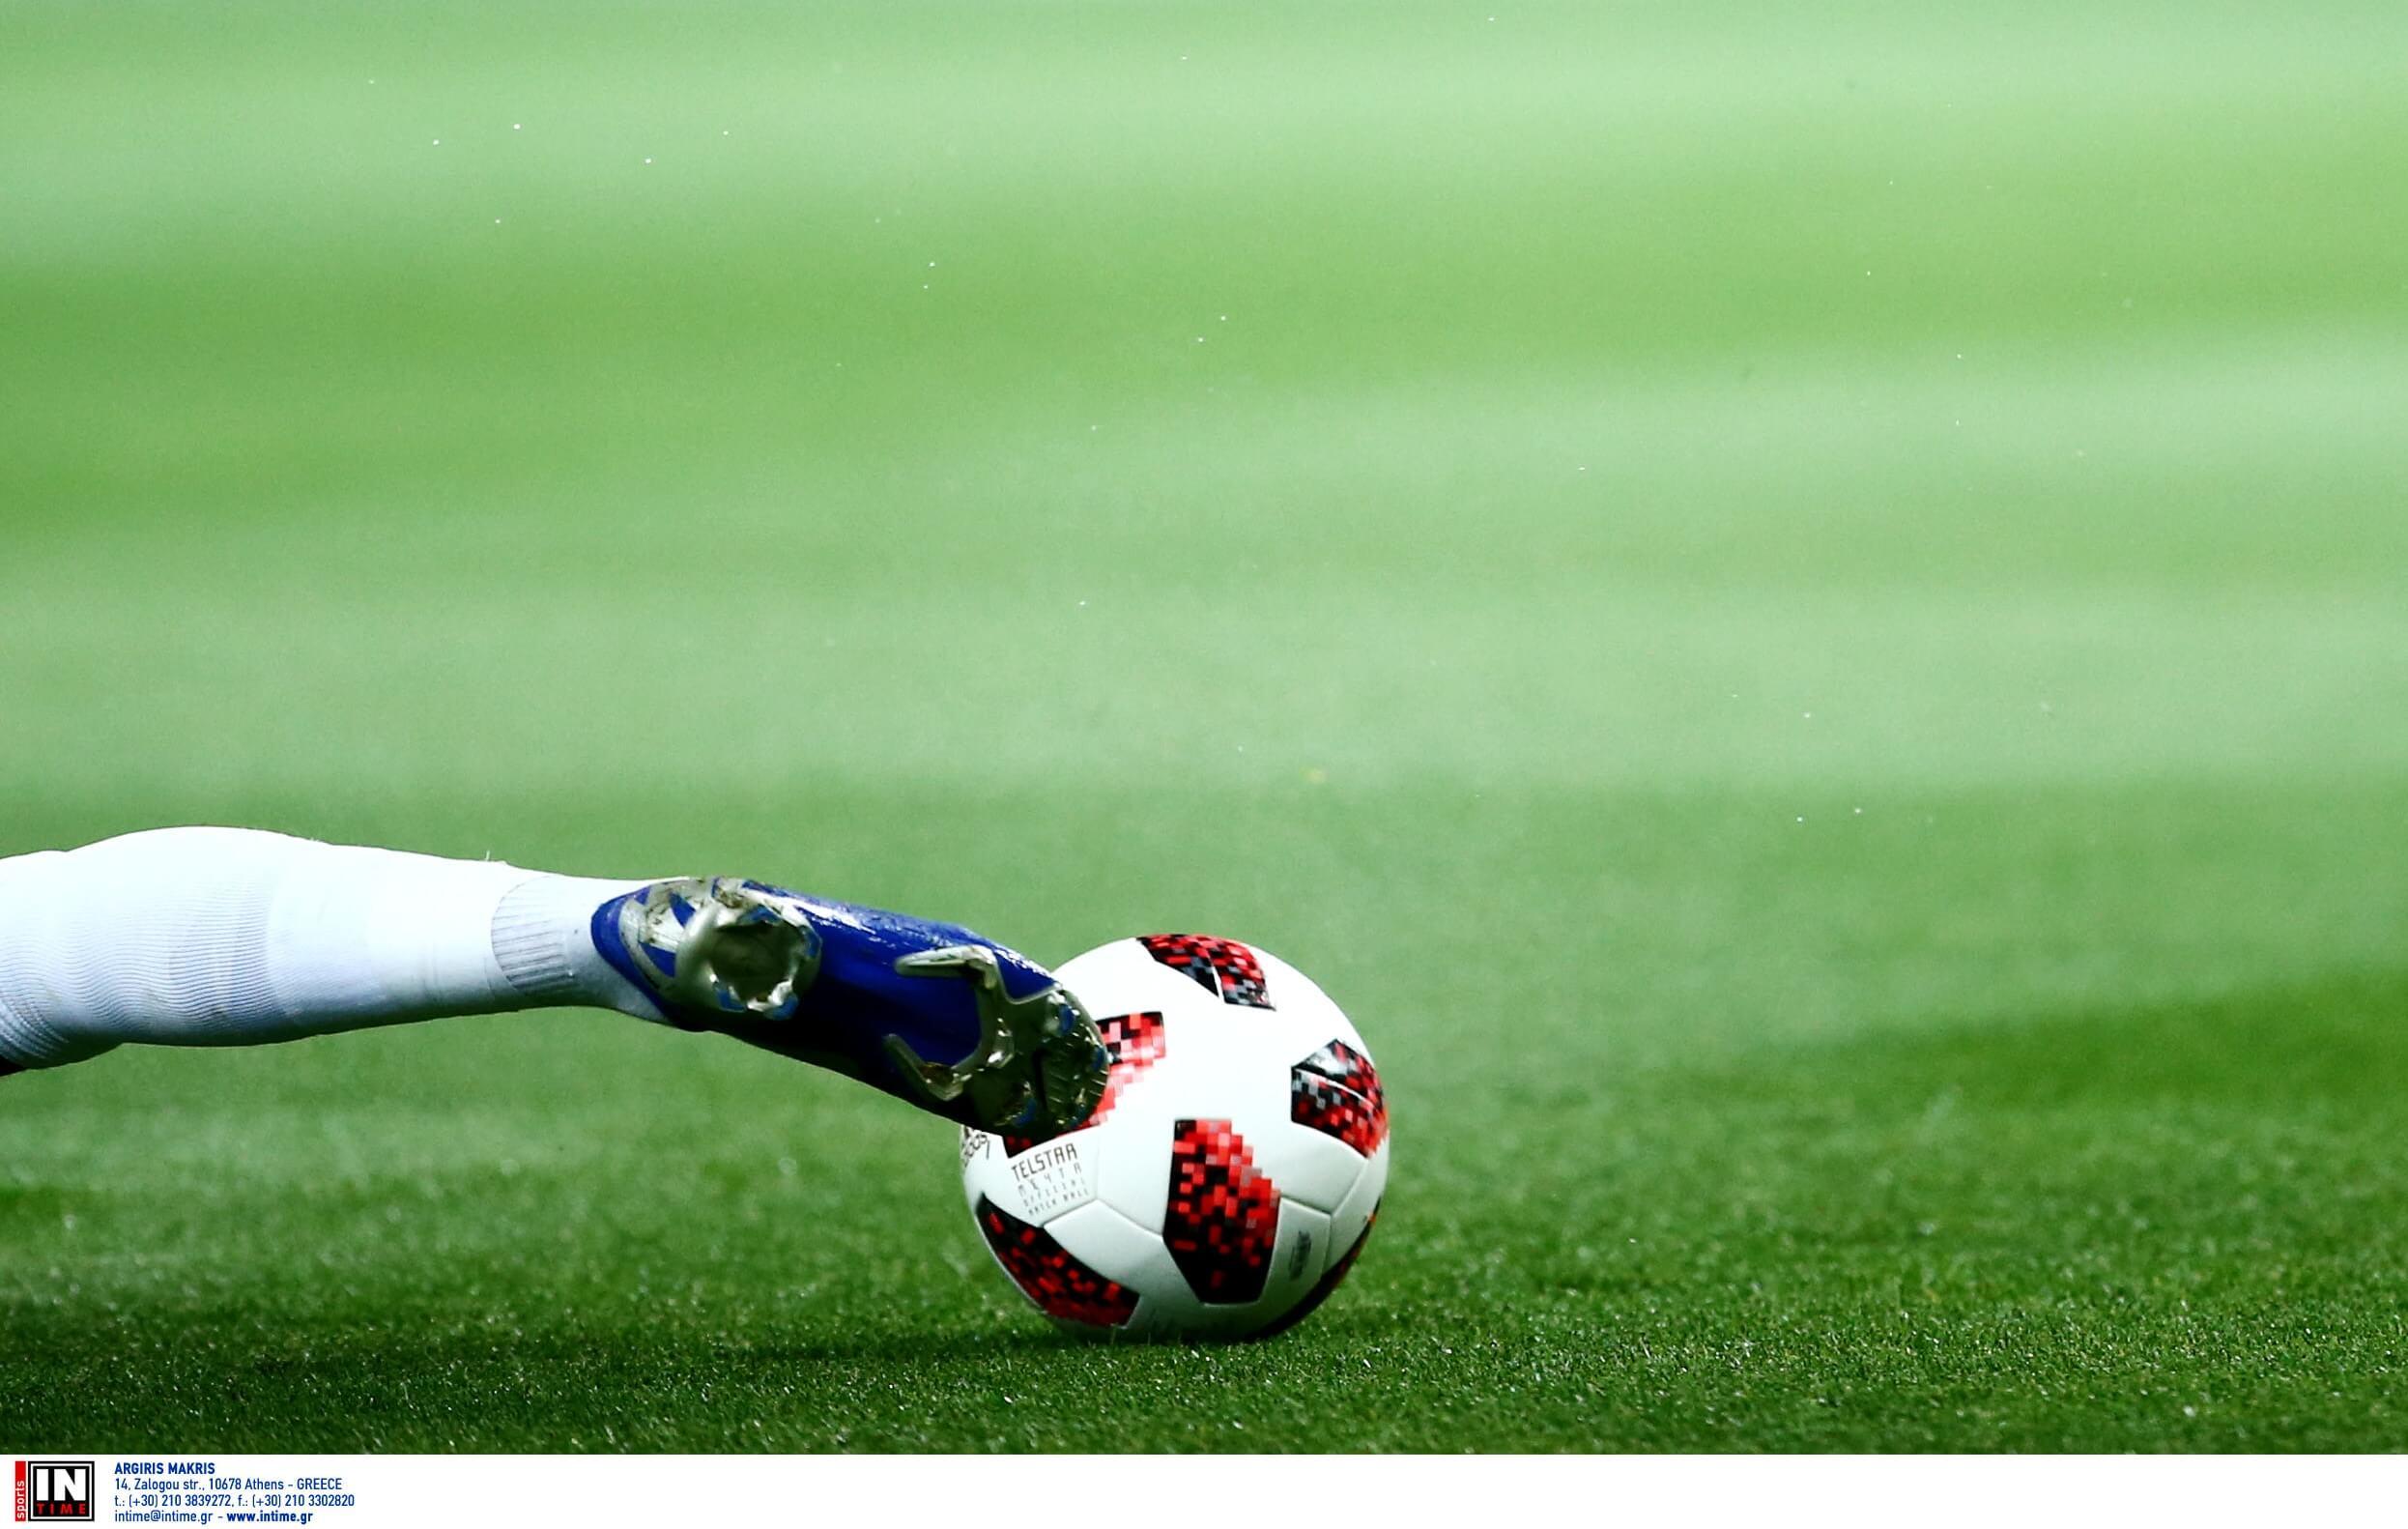 Superleague: Τα καλύτερα γκολ και τα «αχ» του πρώτου γύρου (videos)